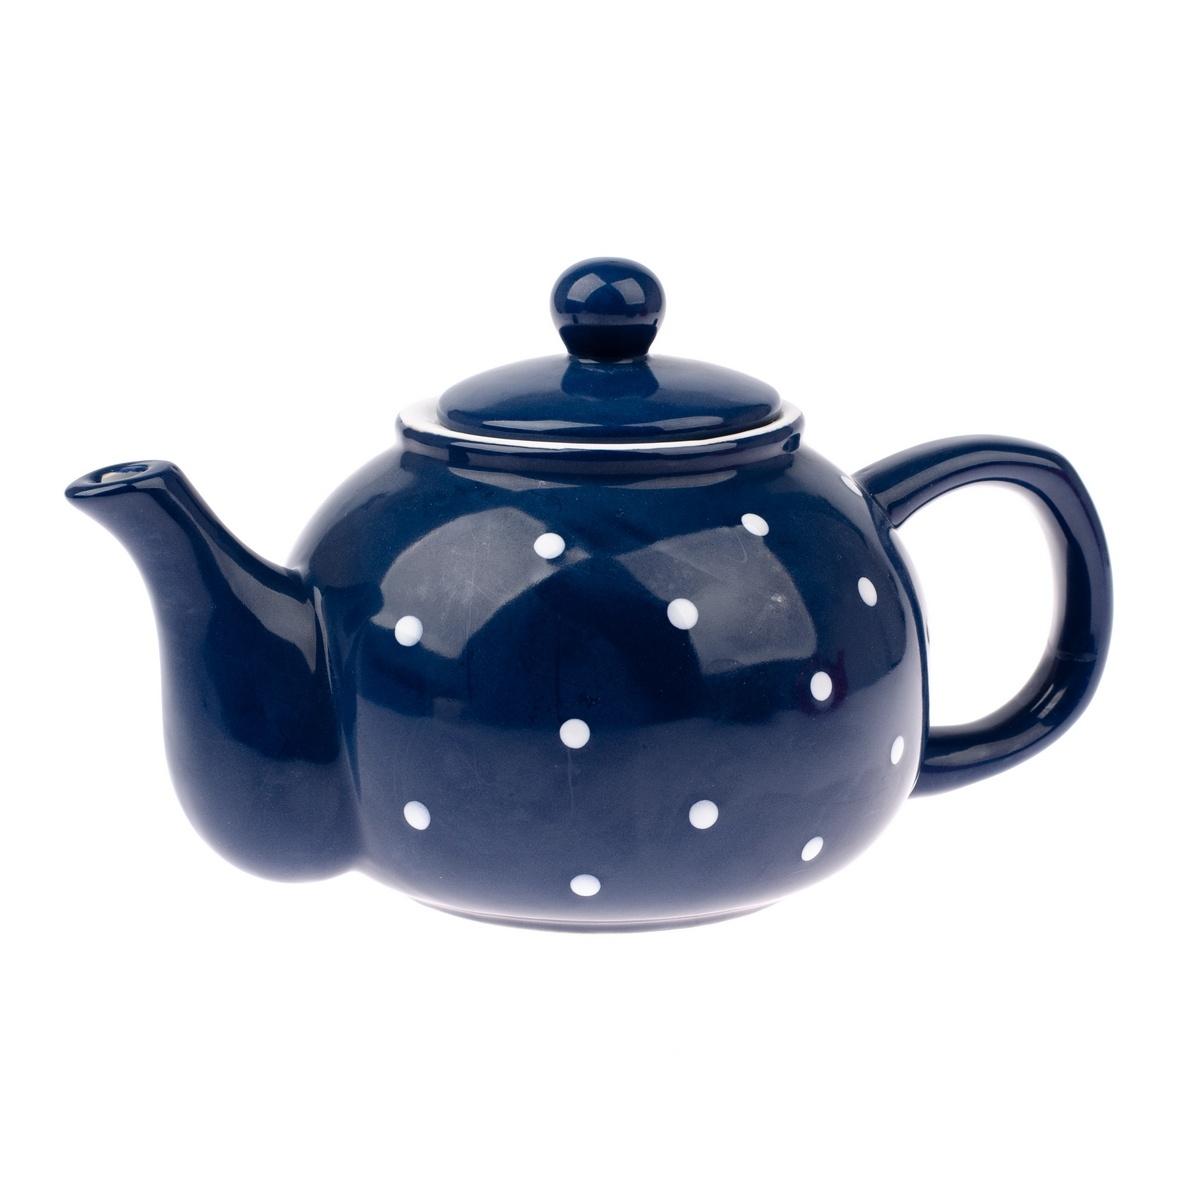 Keramická kanvička na čaj Dots 1 l, modrá